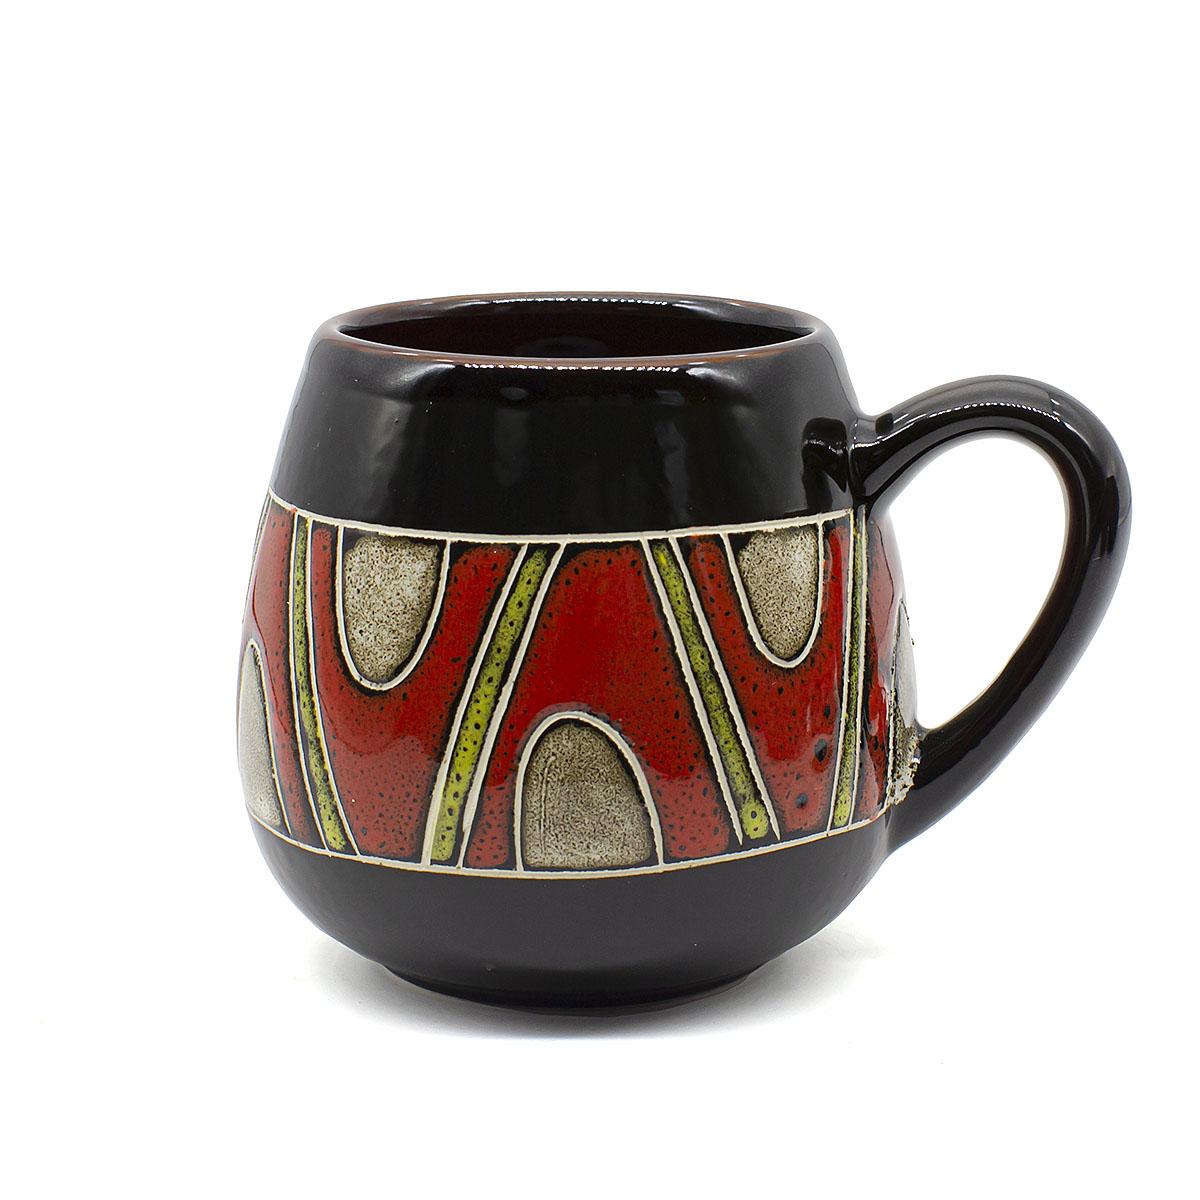 чашка глиняная малиновый щербет 350 мл Чашка глиняная Орнамент, 350 мл